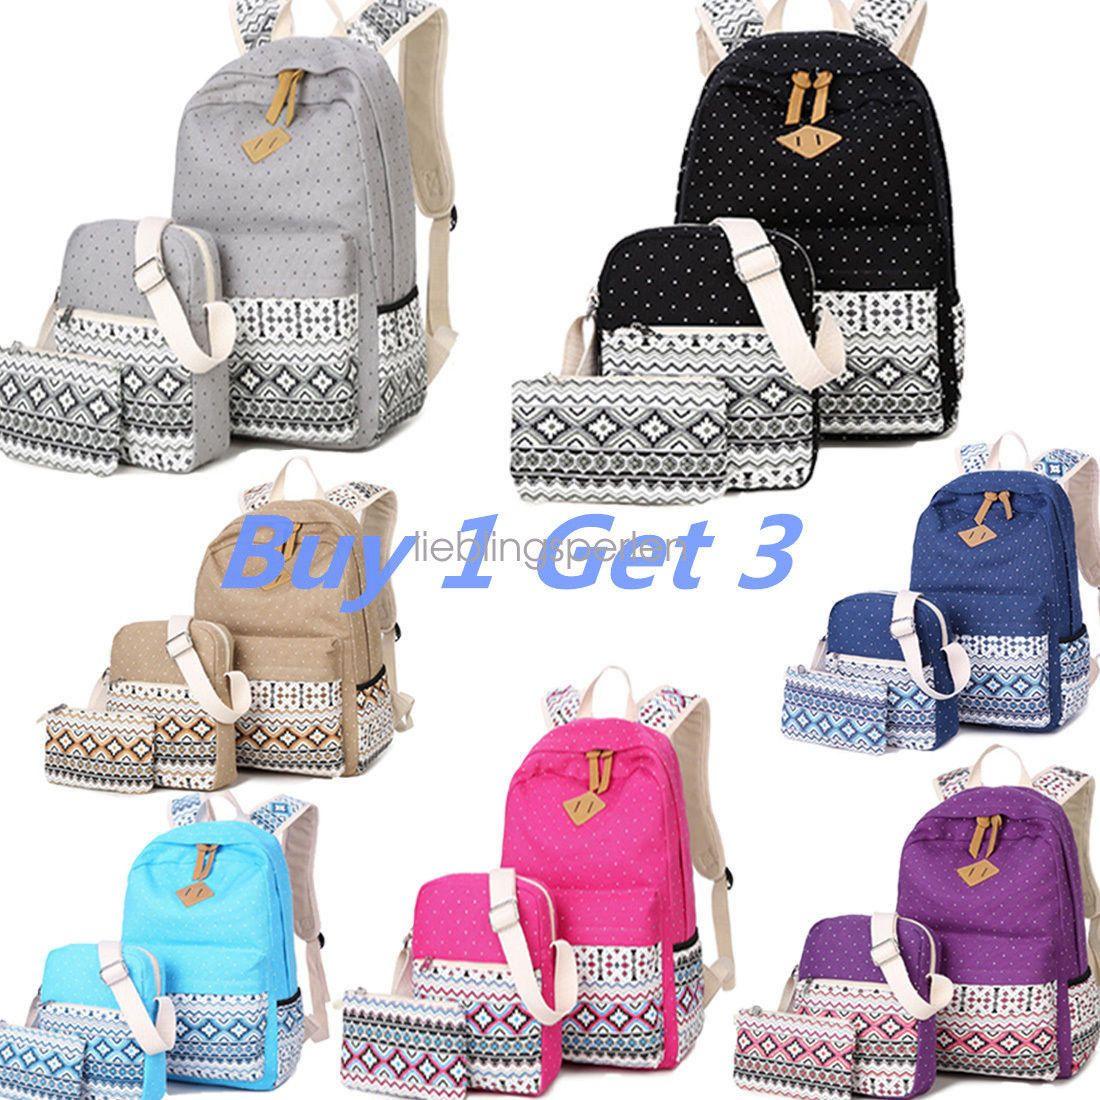 3e149ac3d5 Lp 3Pcs Set Backpack Women Canvas School Bags Travel Bookbagsfor Teenage  Girls